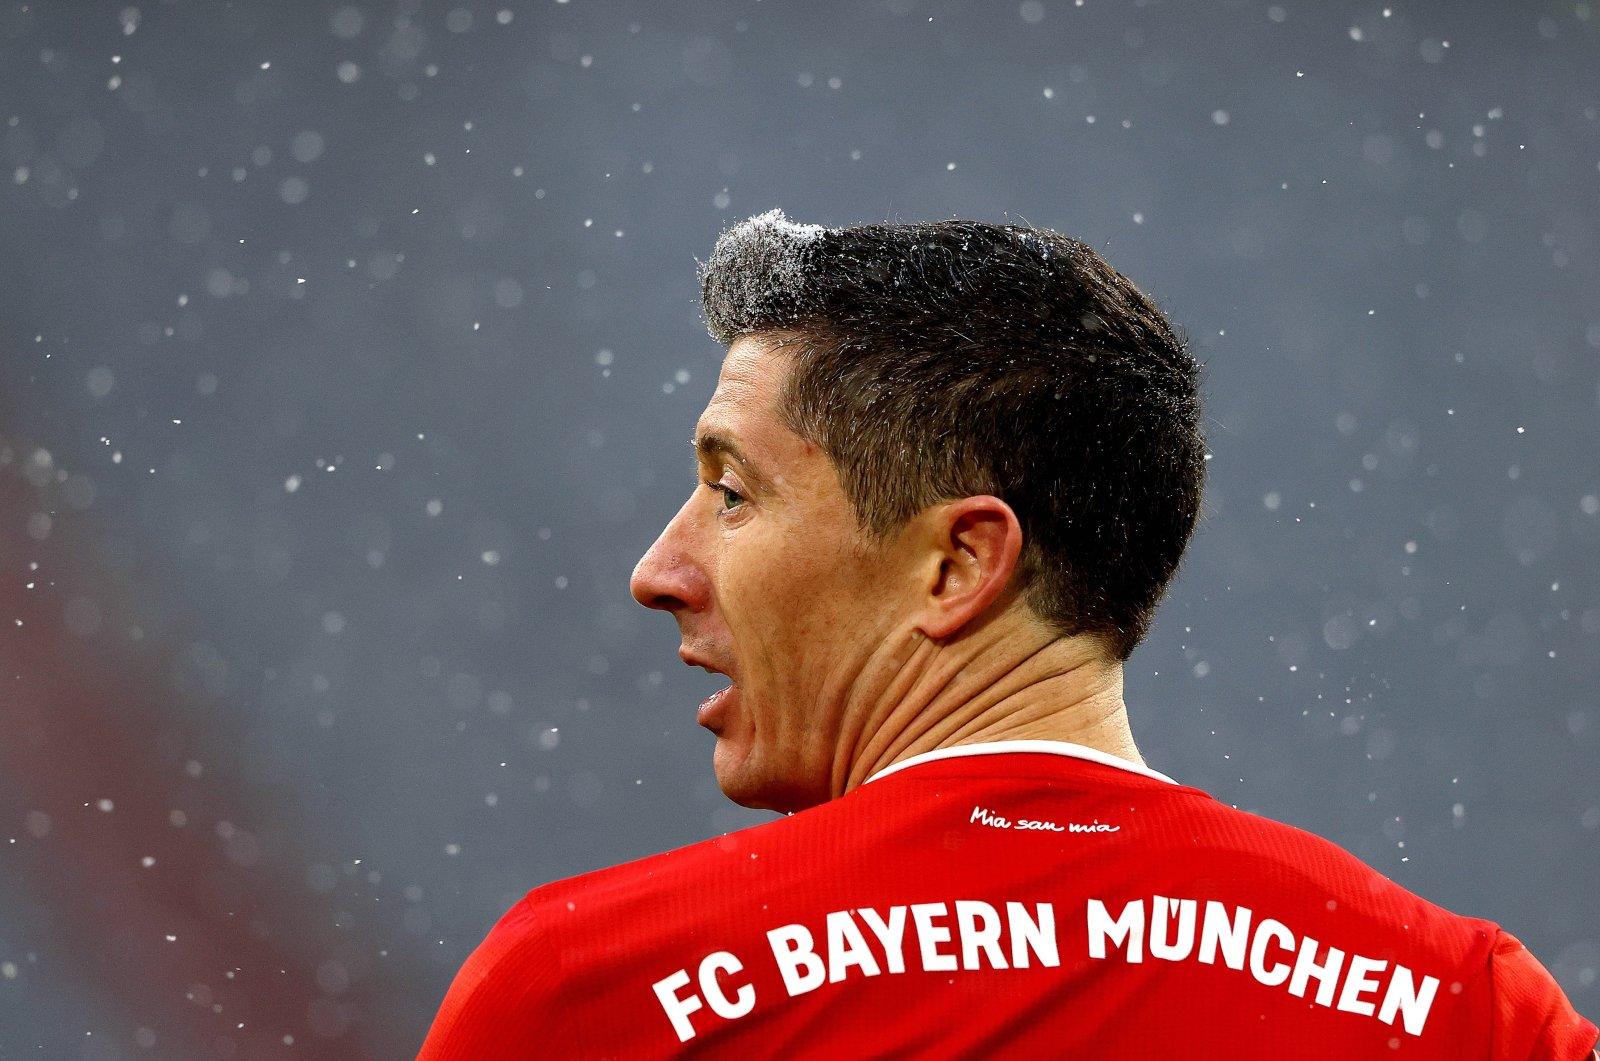 Bayern Munich's Robert Lewandowski during a German Bundesliga match against SC Freiburg, Munich, Germany, Jan. 17, 2021. (EPA Photo)